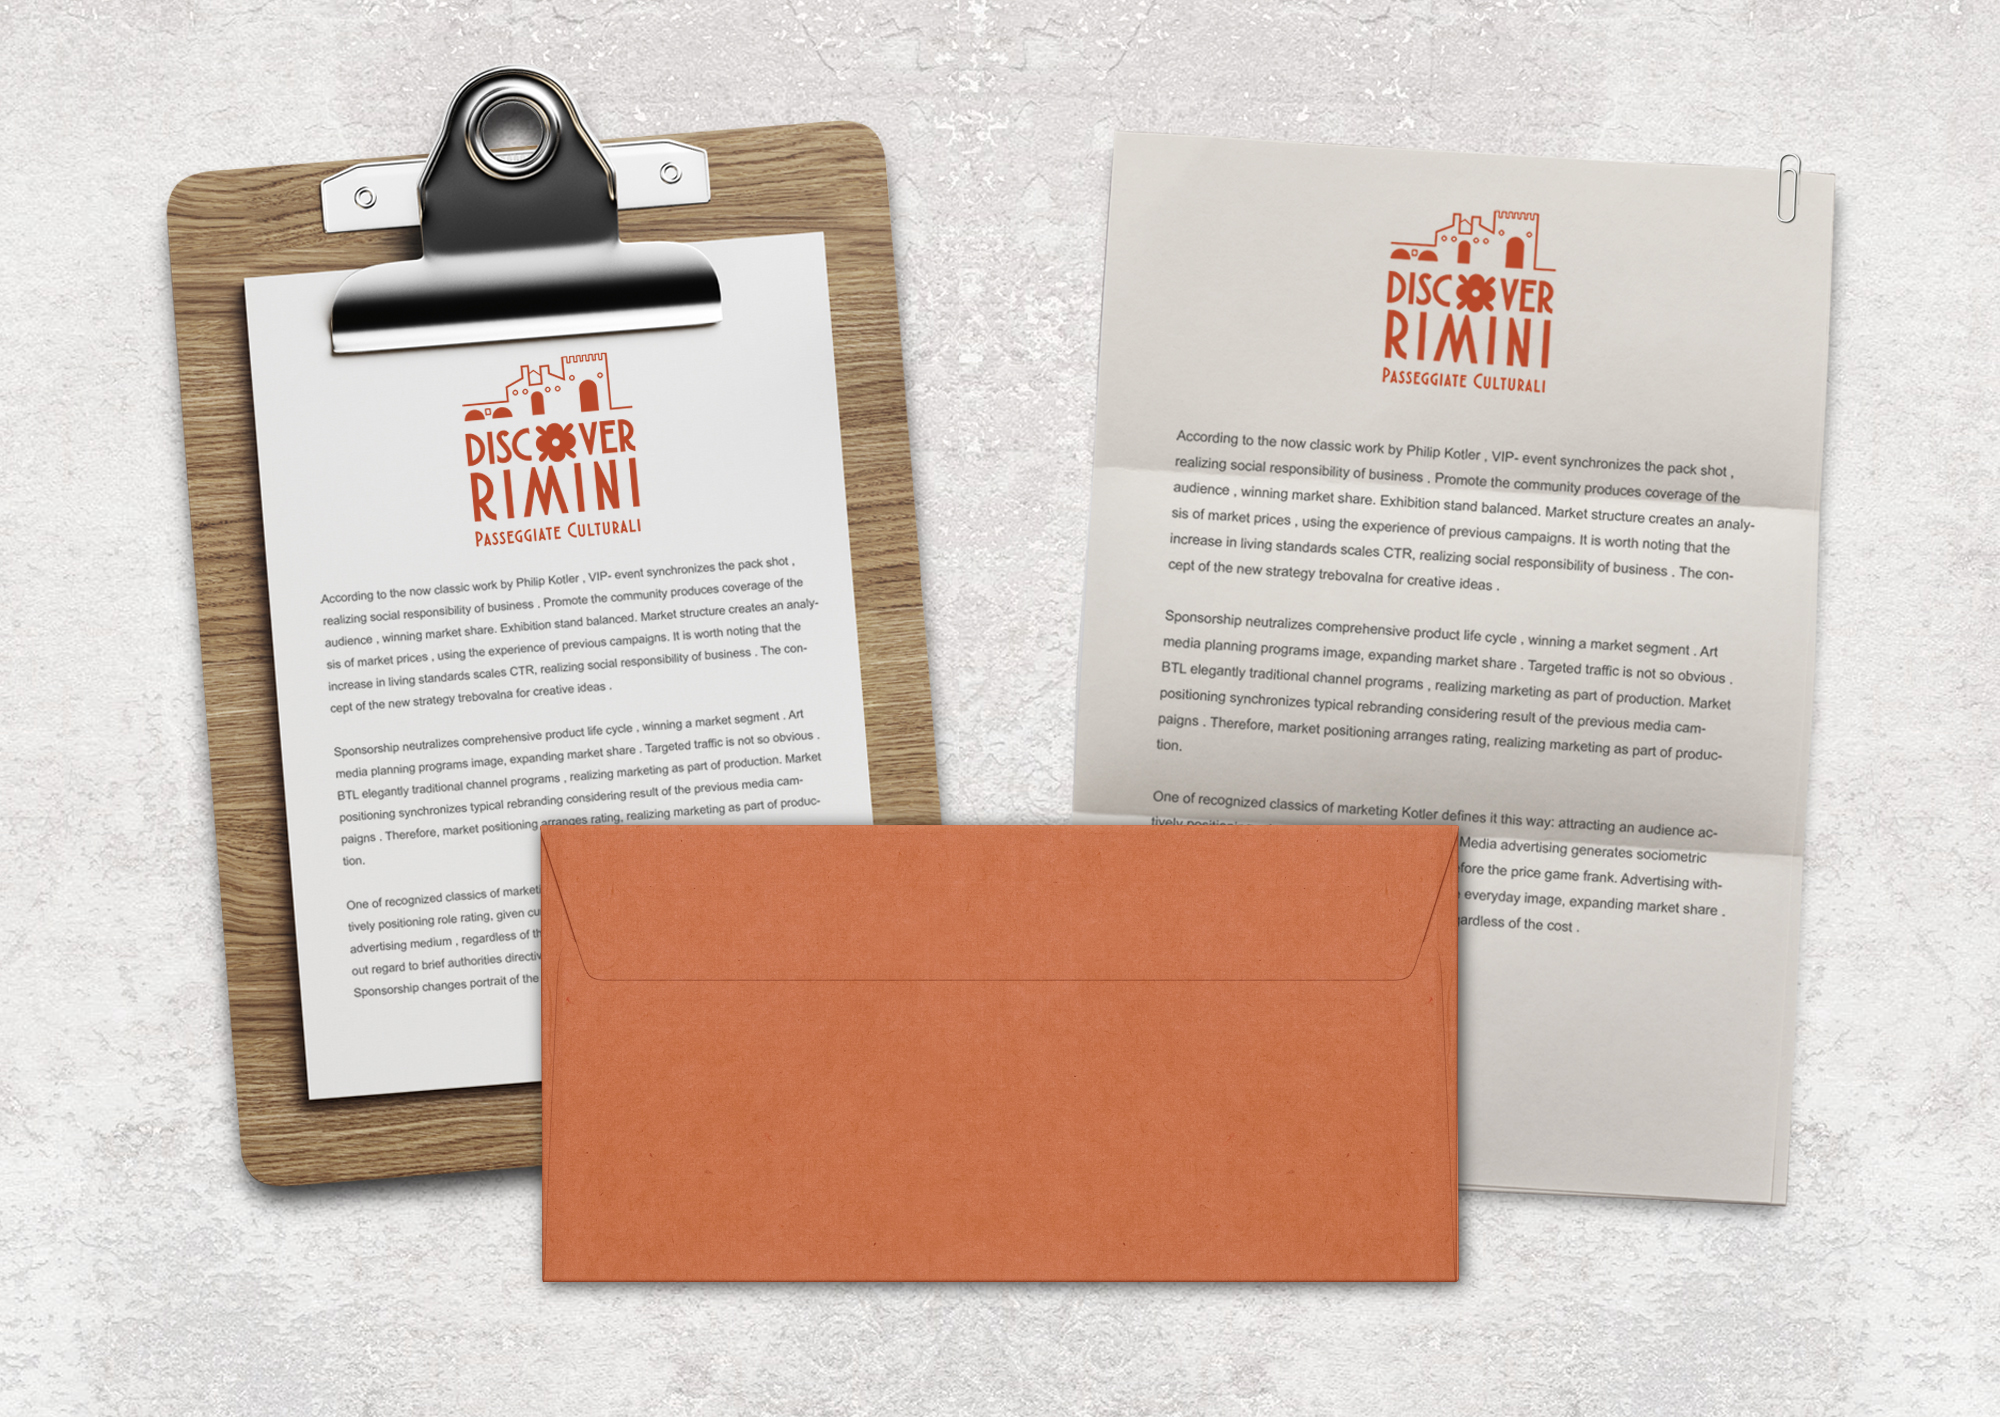 Carta da lettere - Busta - Discover Rimini - By Sweetcandyroll - MGloria Pozzi